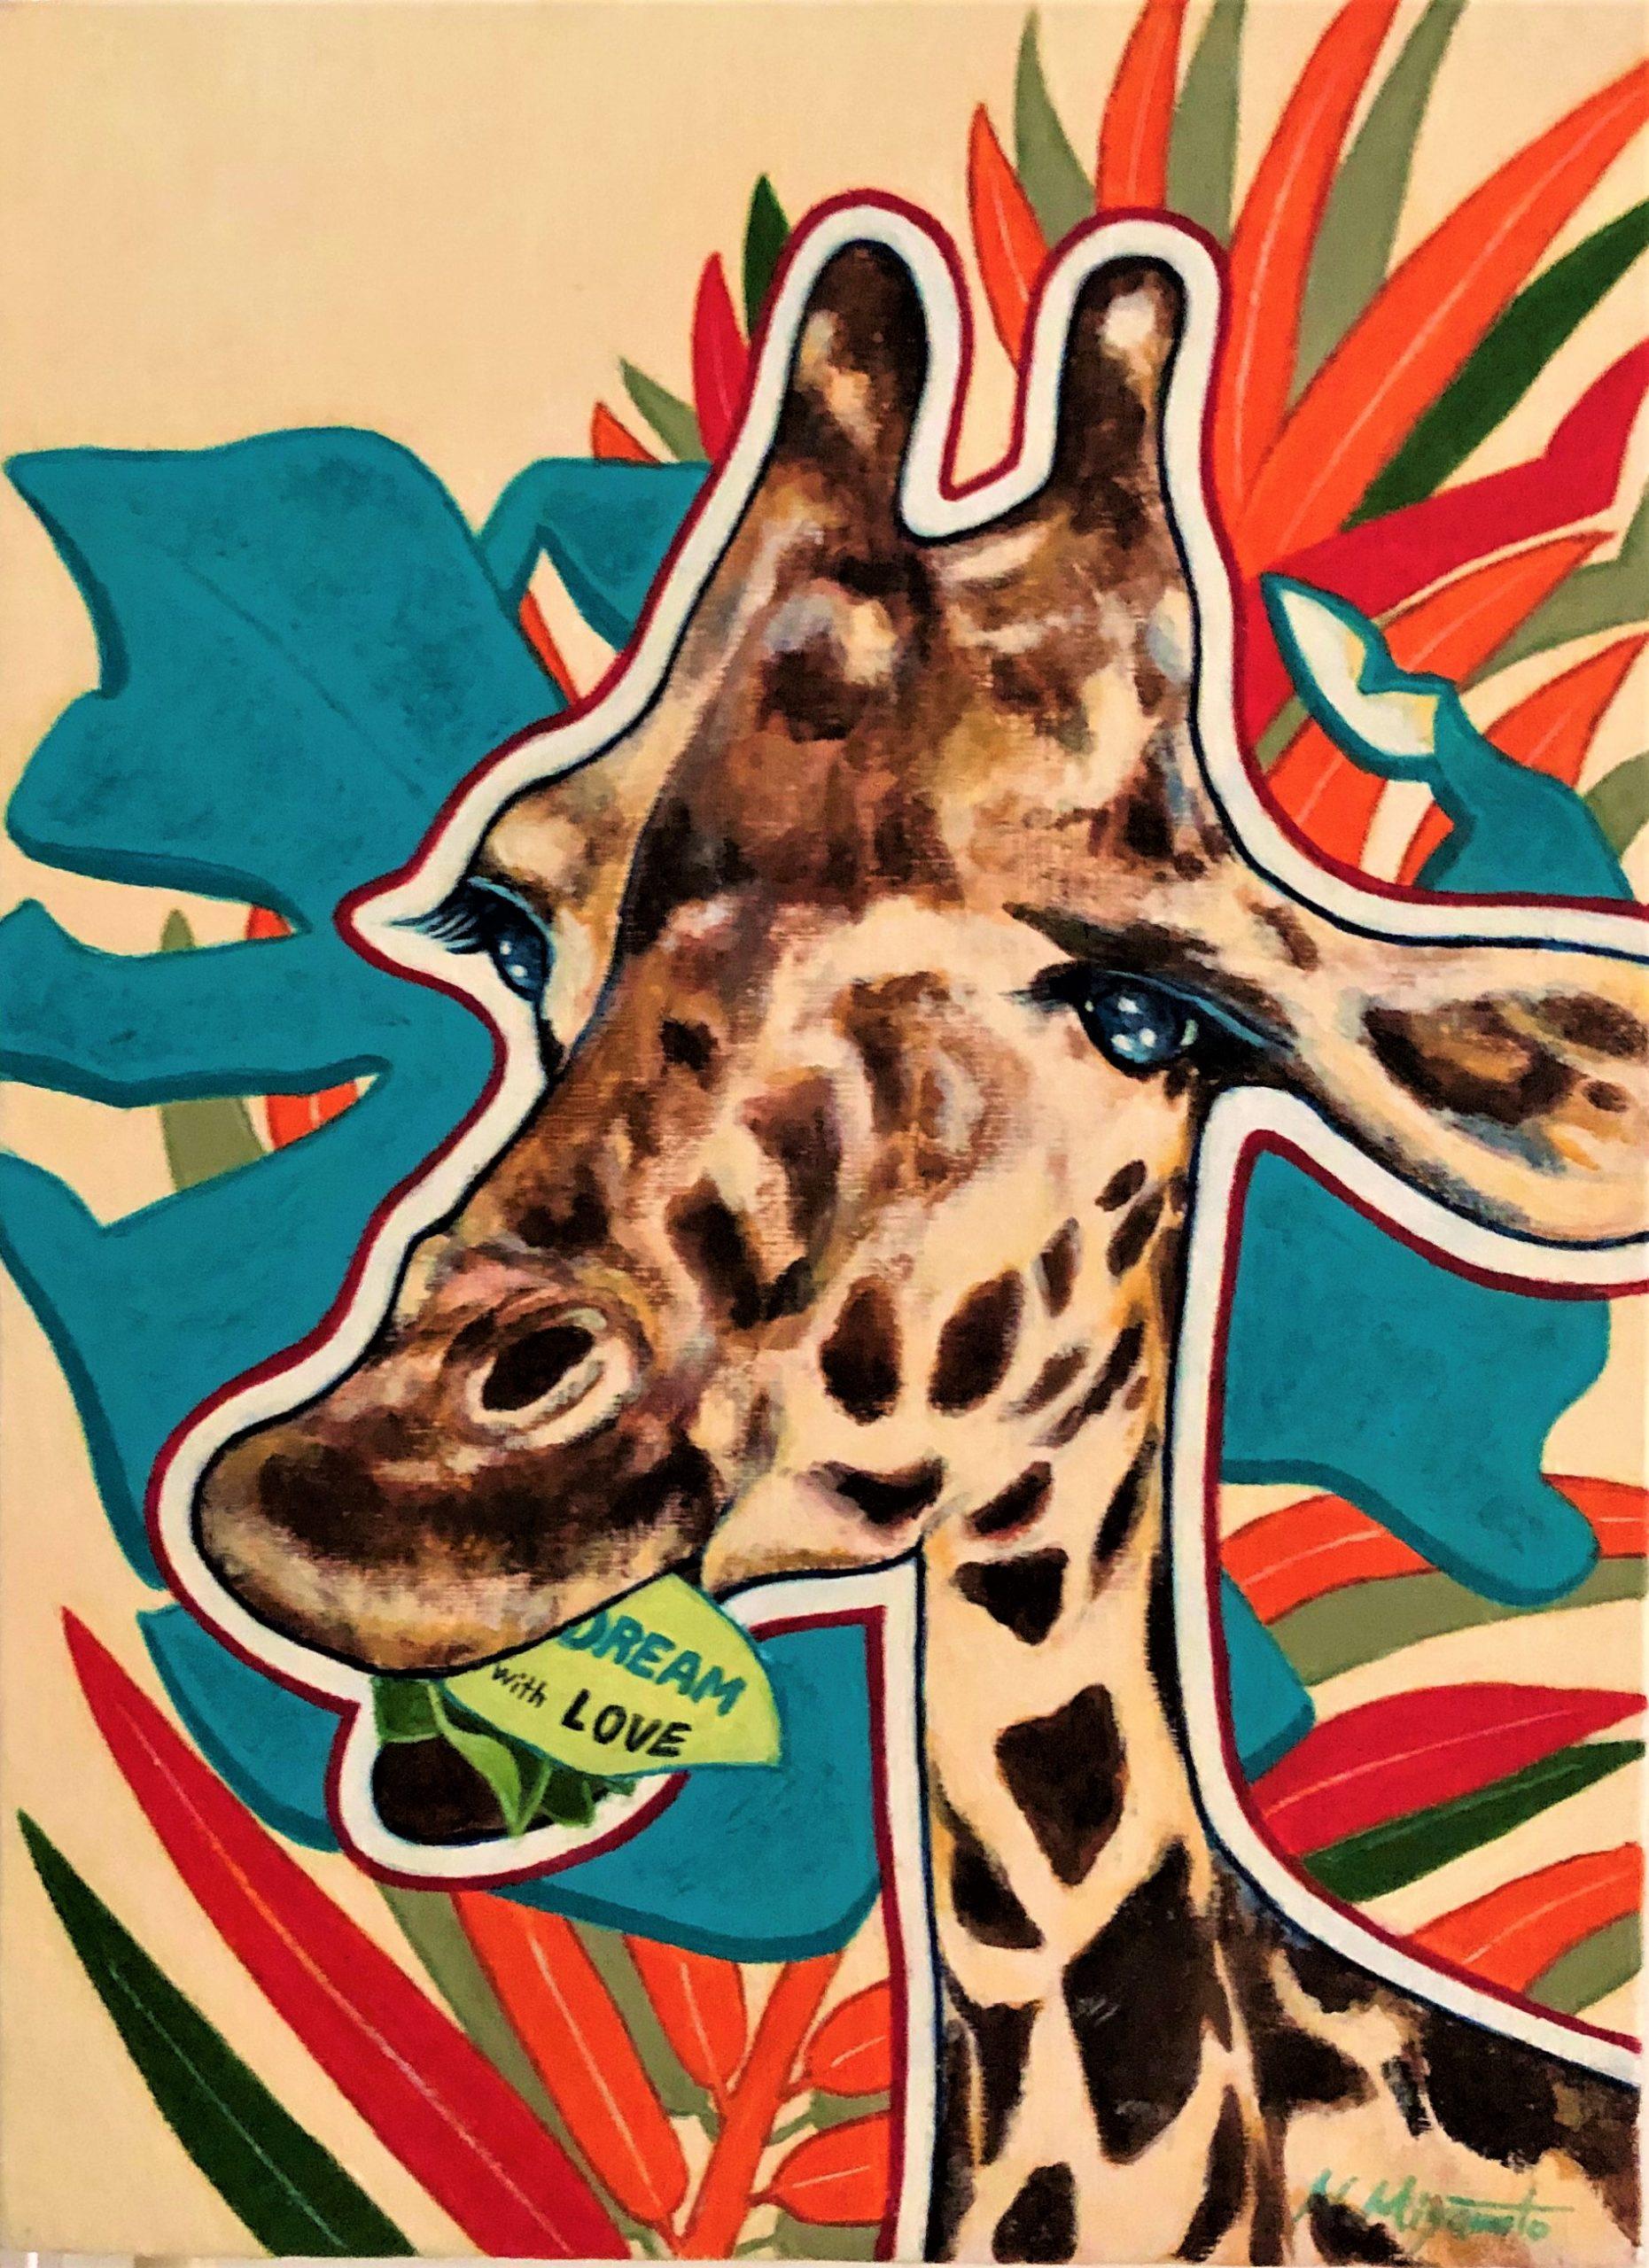 DREAM -with LOVE (giraffe)